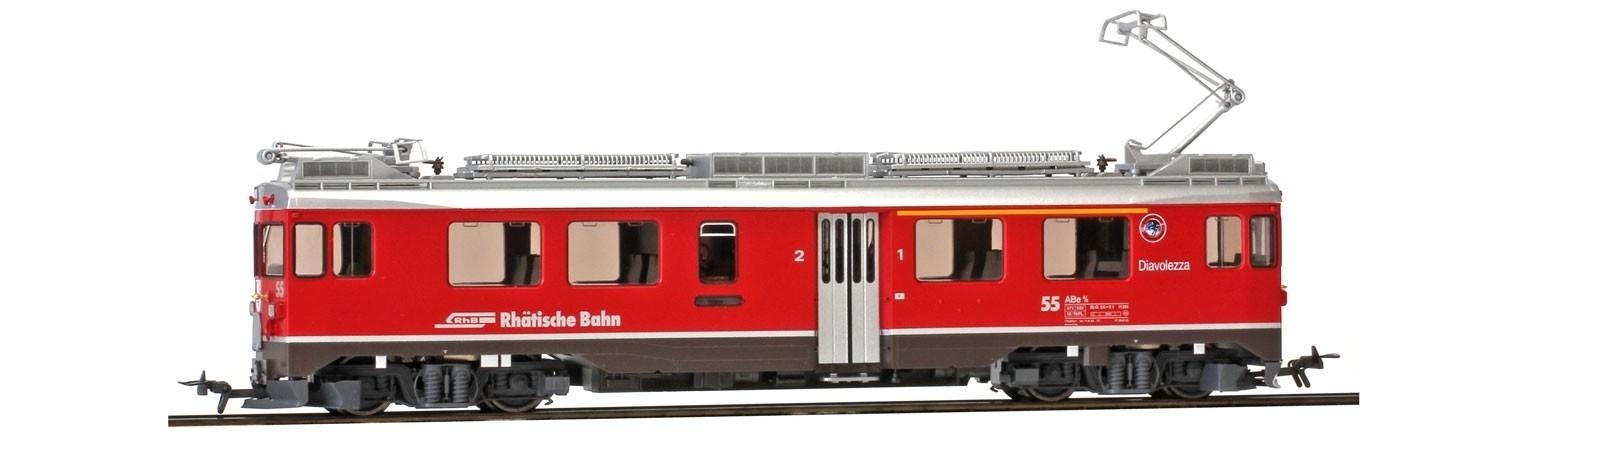 "1269107 RhB ABe 4/4 55 Berninatriebwagen ""Diavolezza""-1"